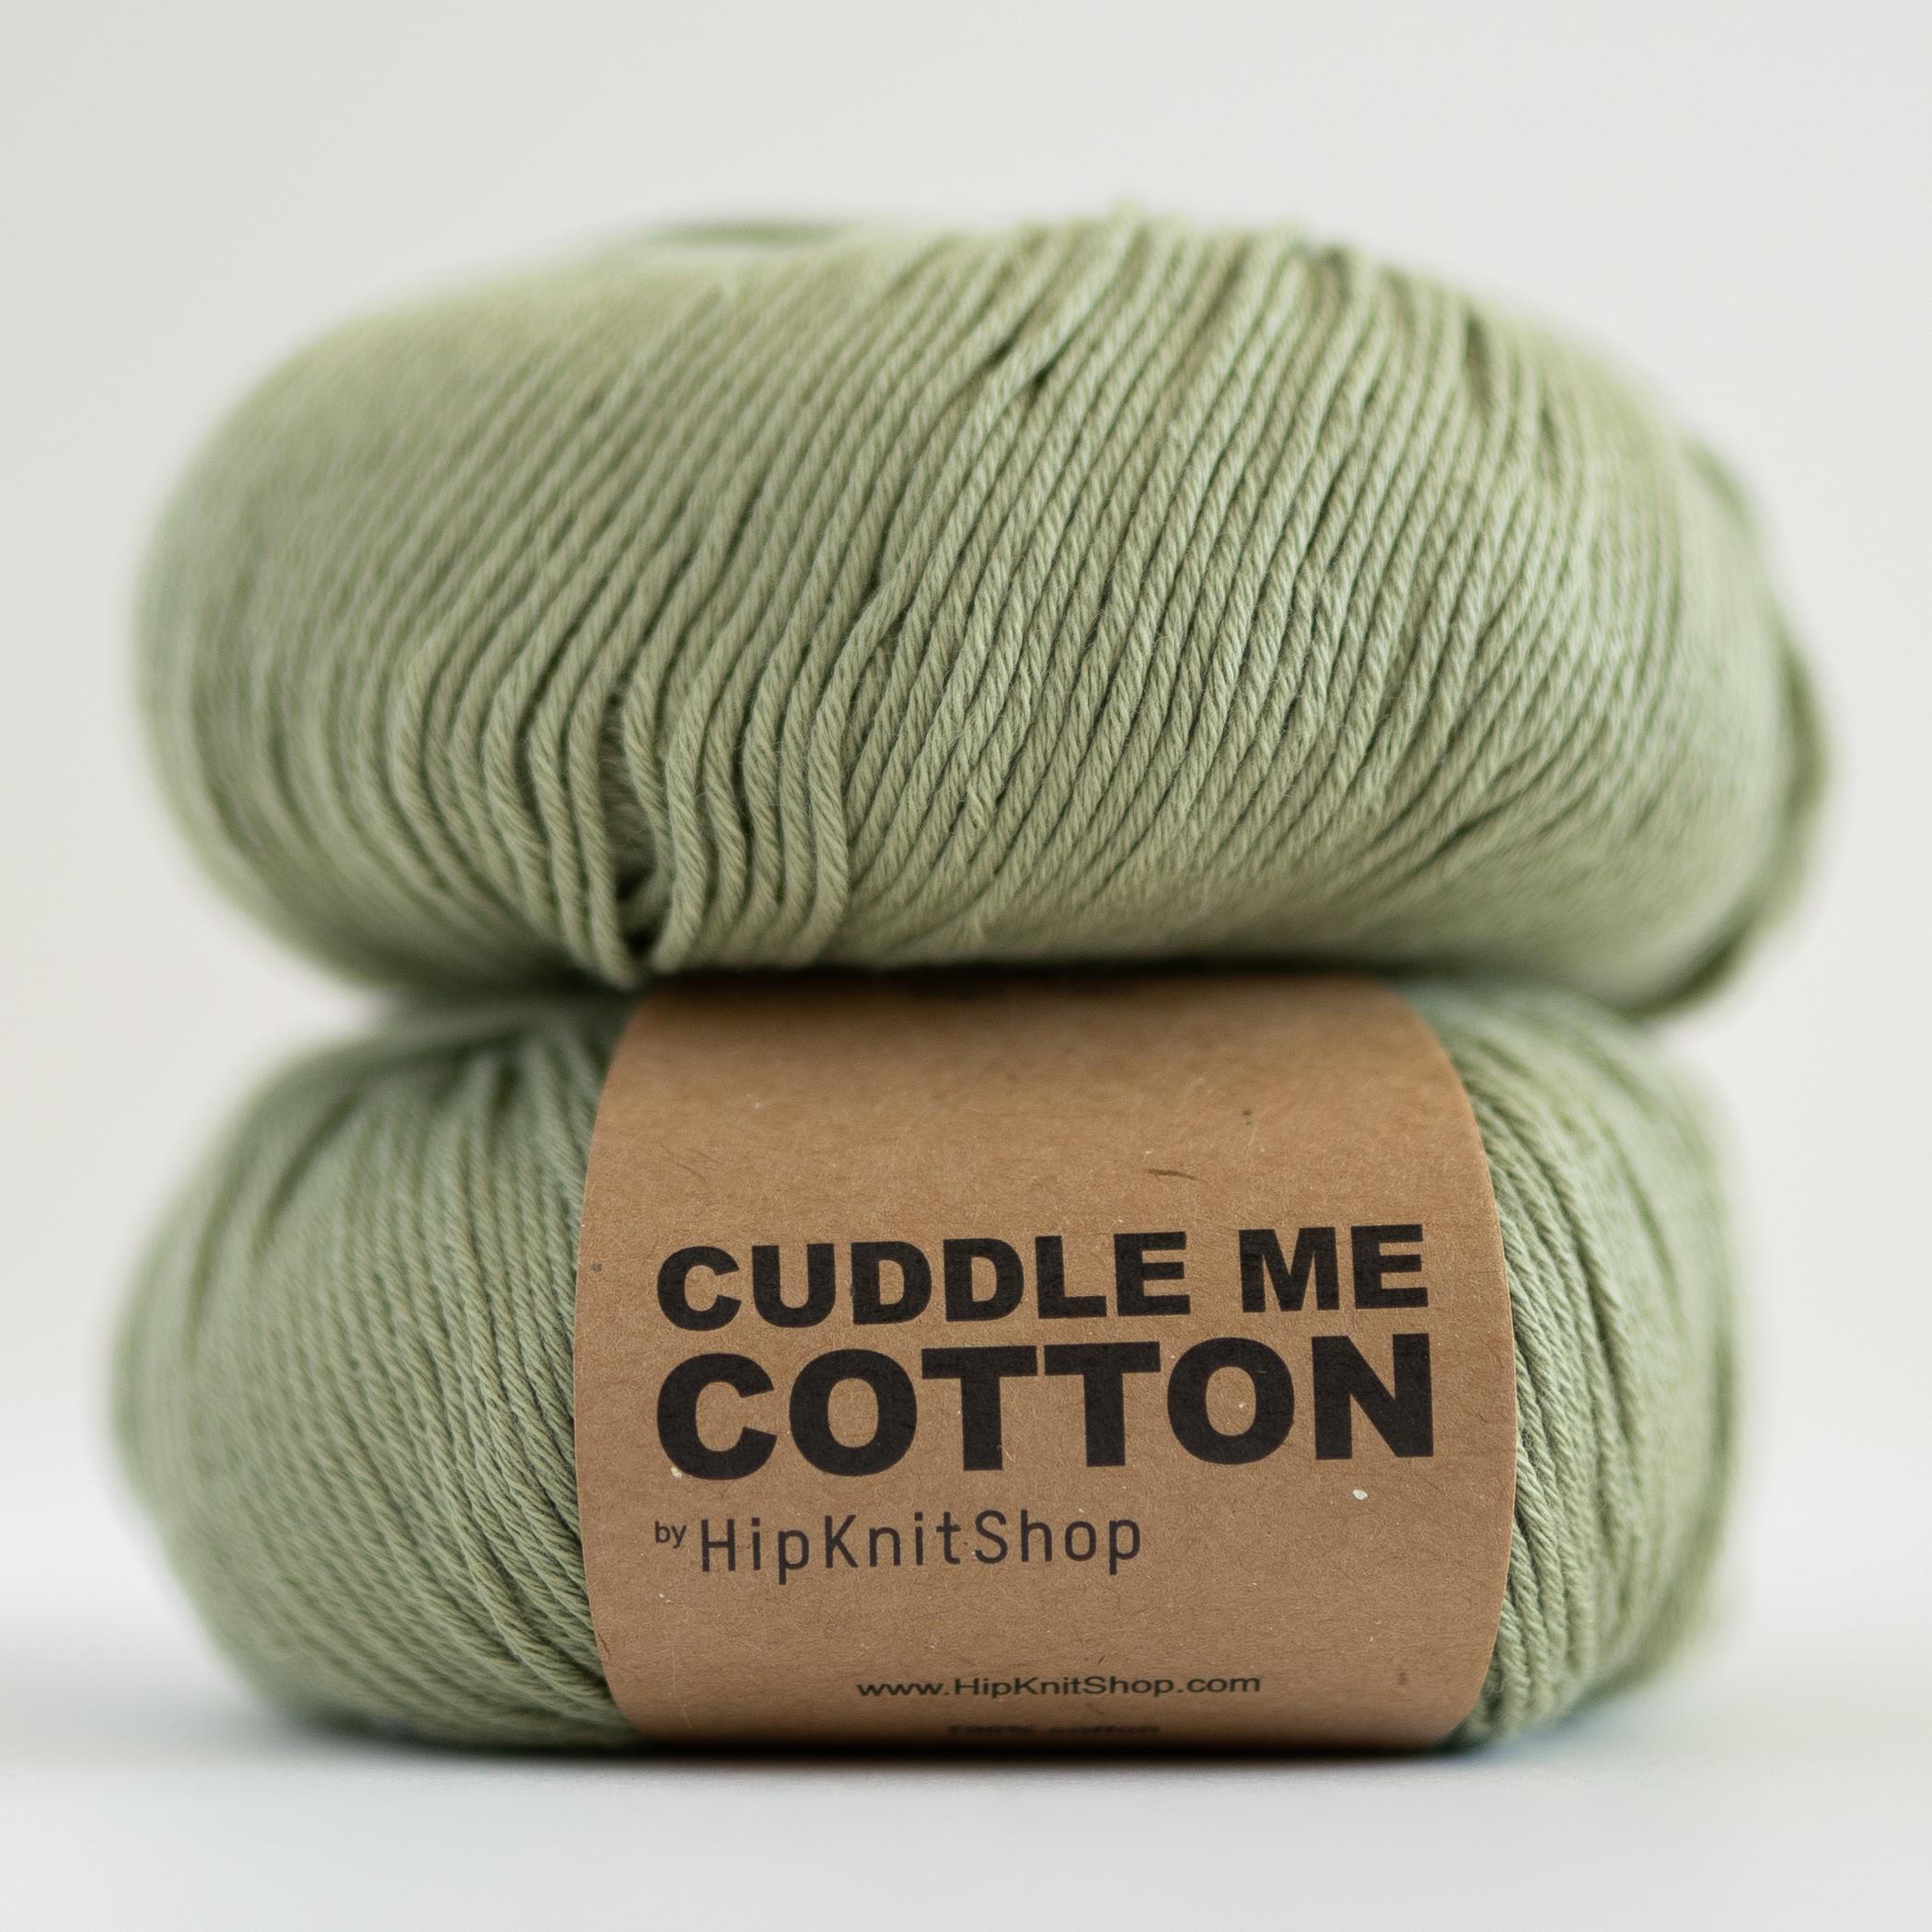 cotton yarn needlesize 4 mm